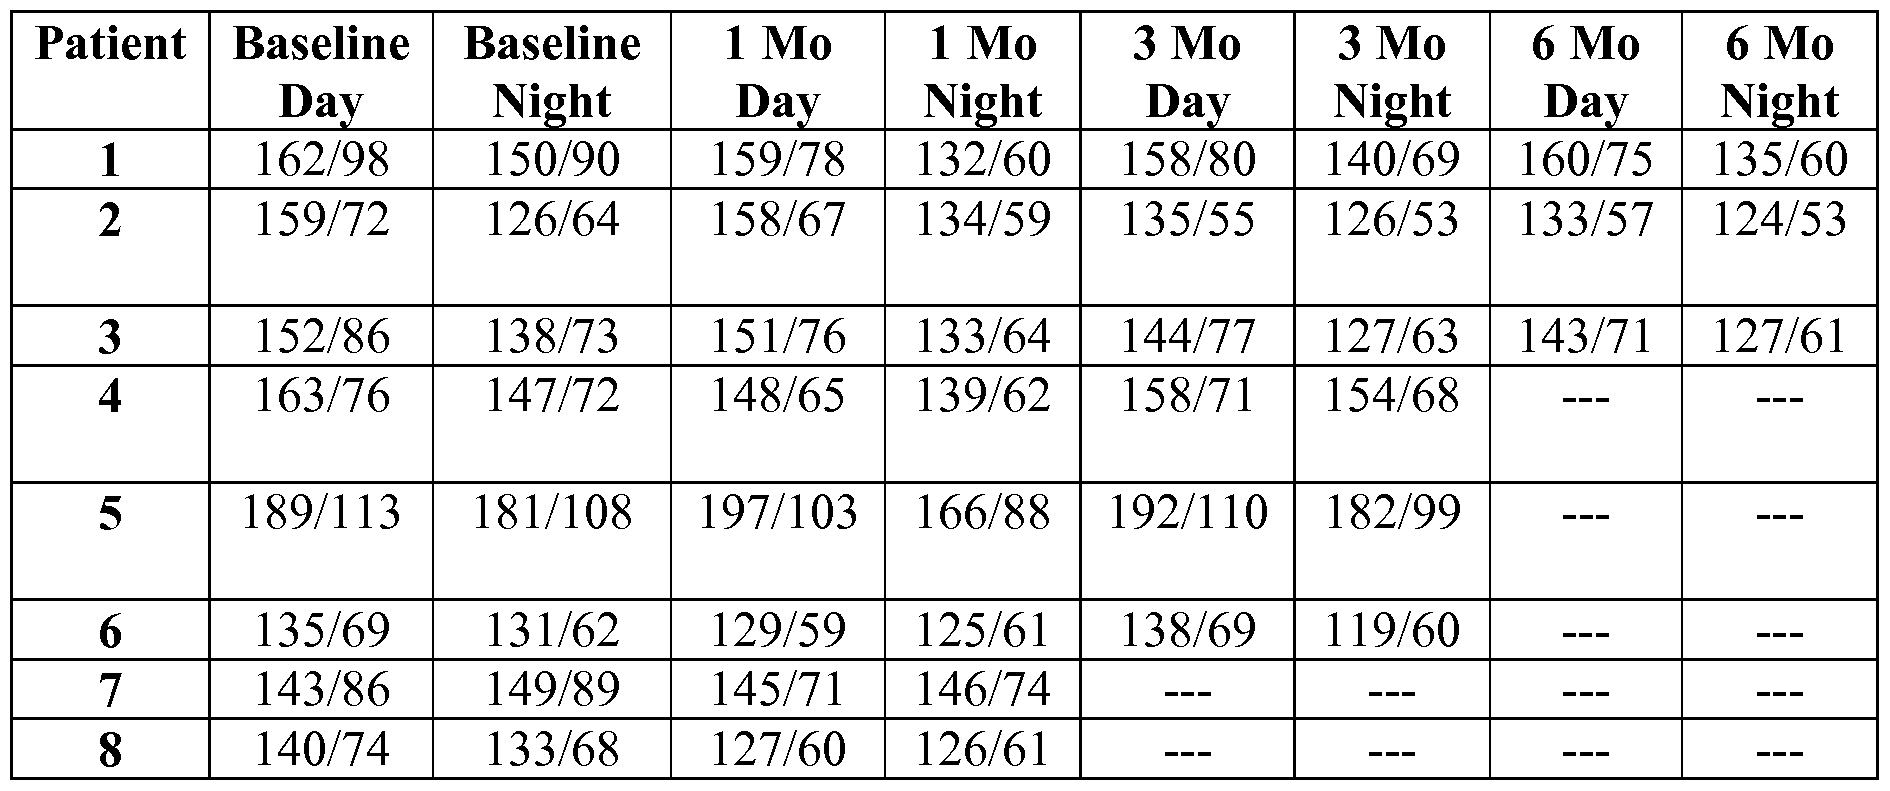 127 68 monitor de presión arterial